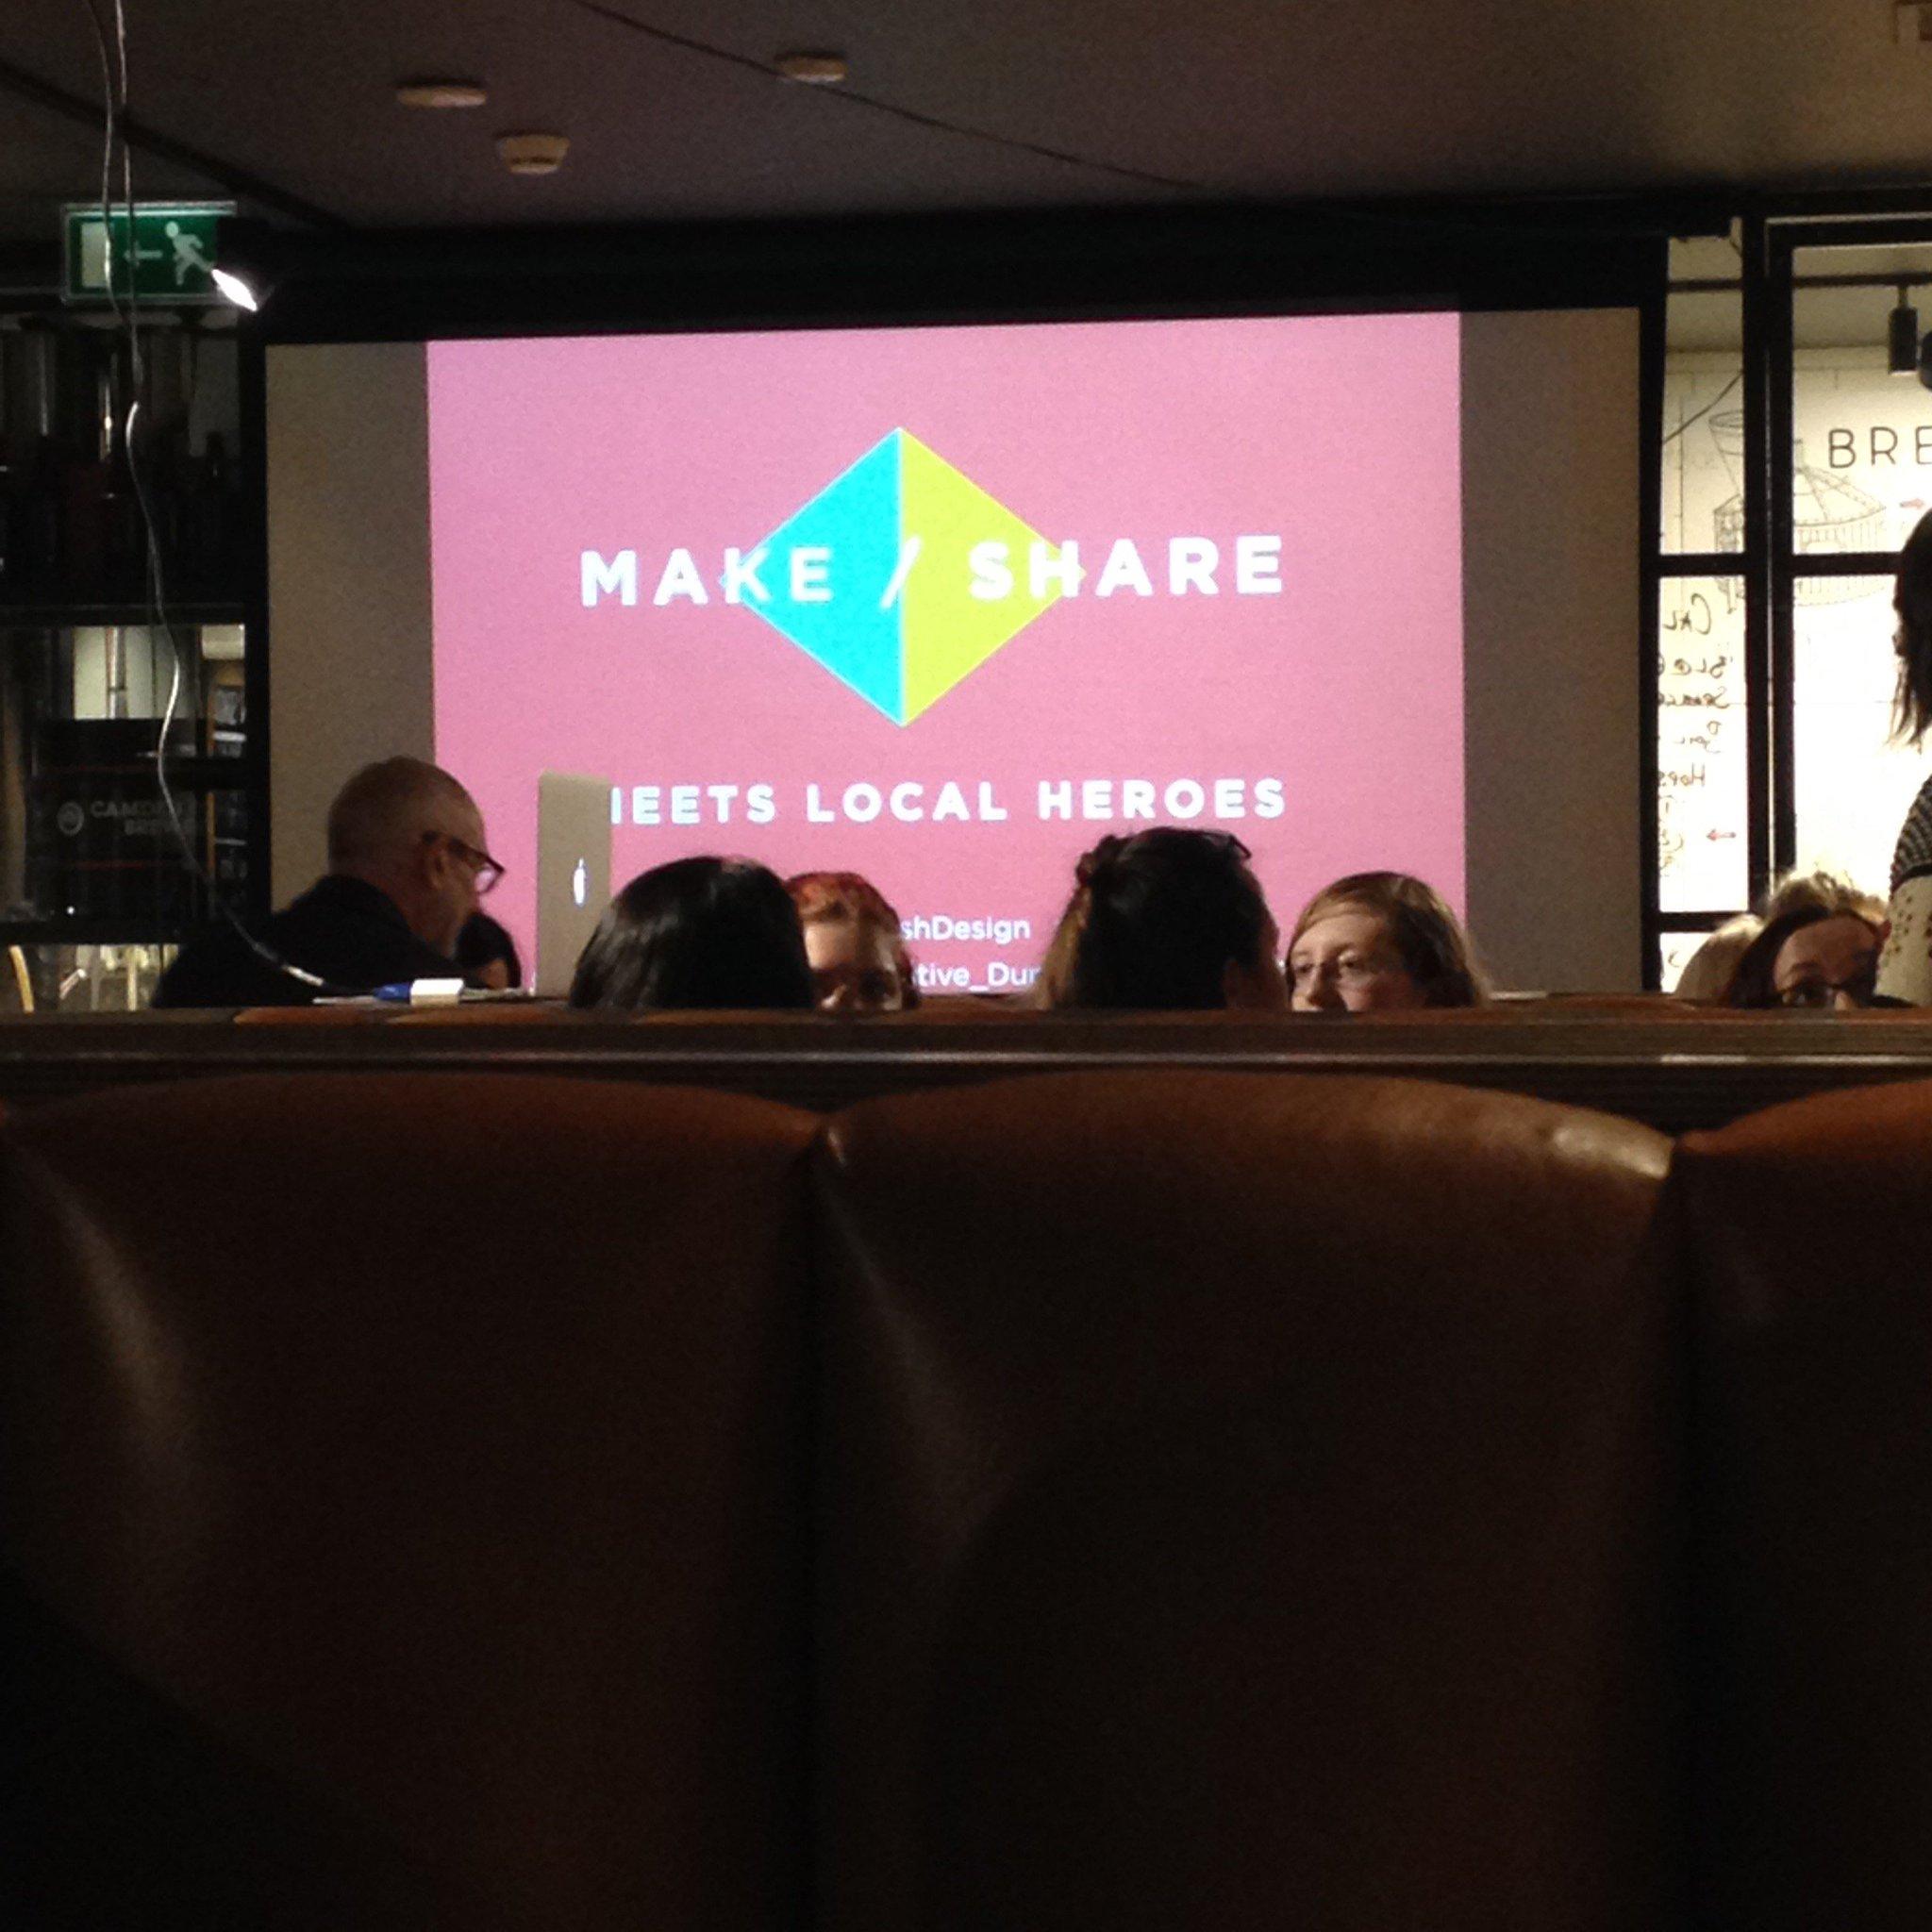 #Makeshare tonight at the @BeerKitchenDUN #localheroes #cbdsn https://t.co/p9lsvbXrqL